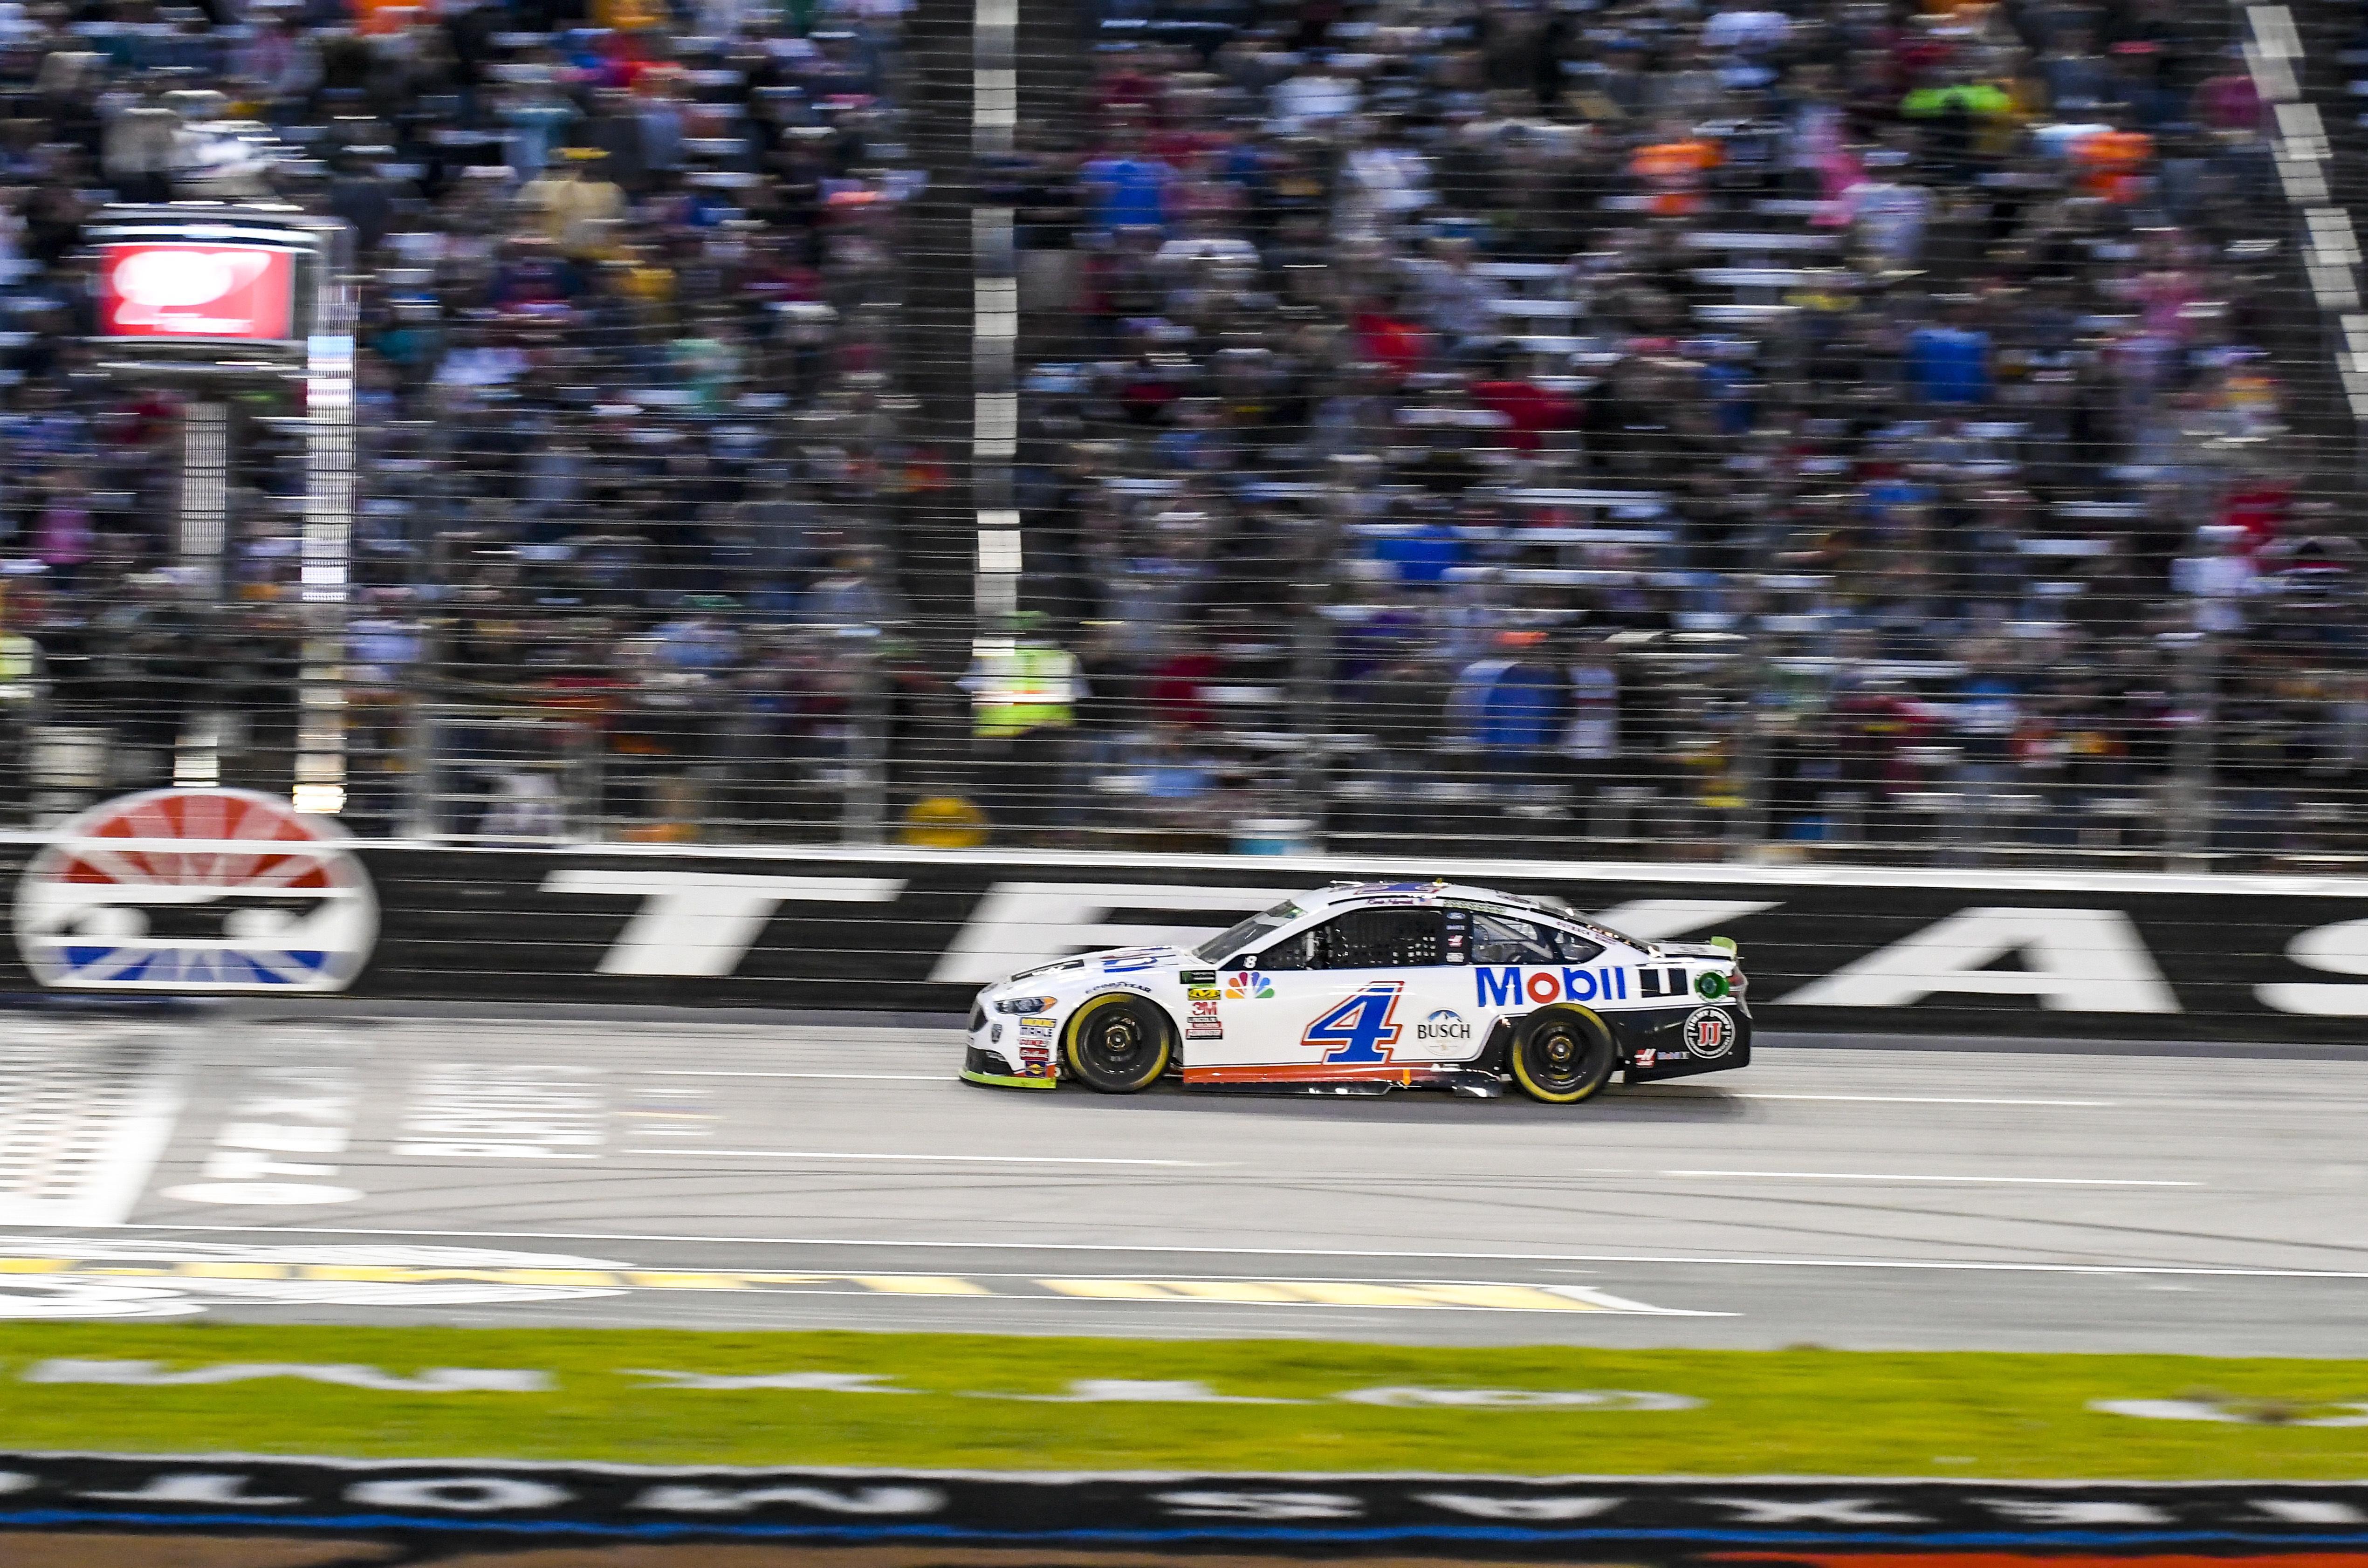 Kevin Harvick earns his shot at NASCAR Cup title with win at